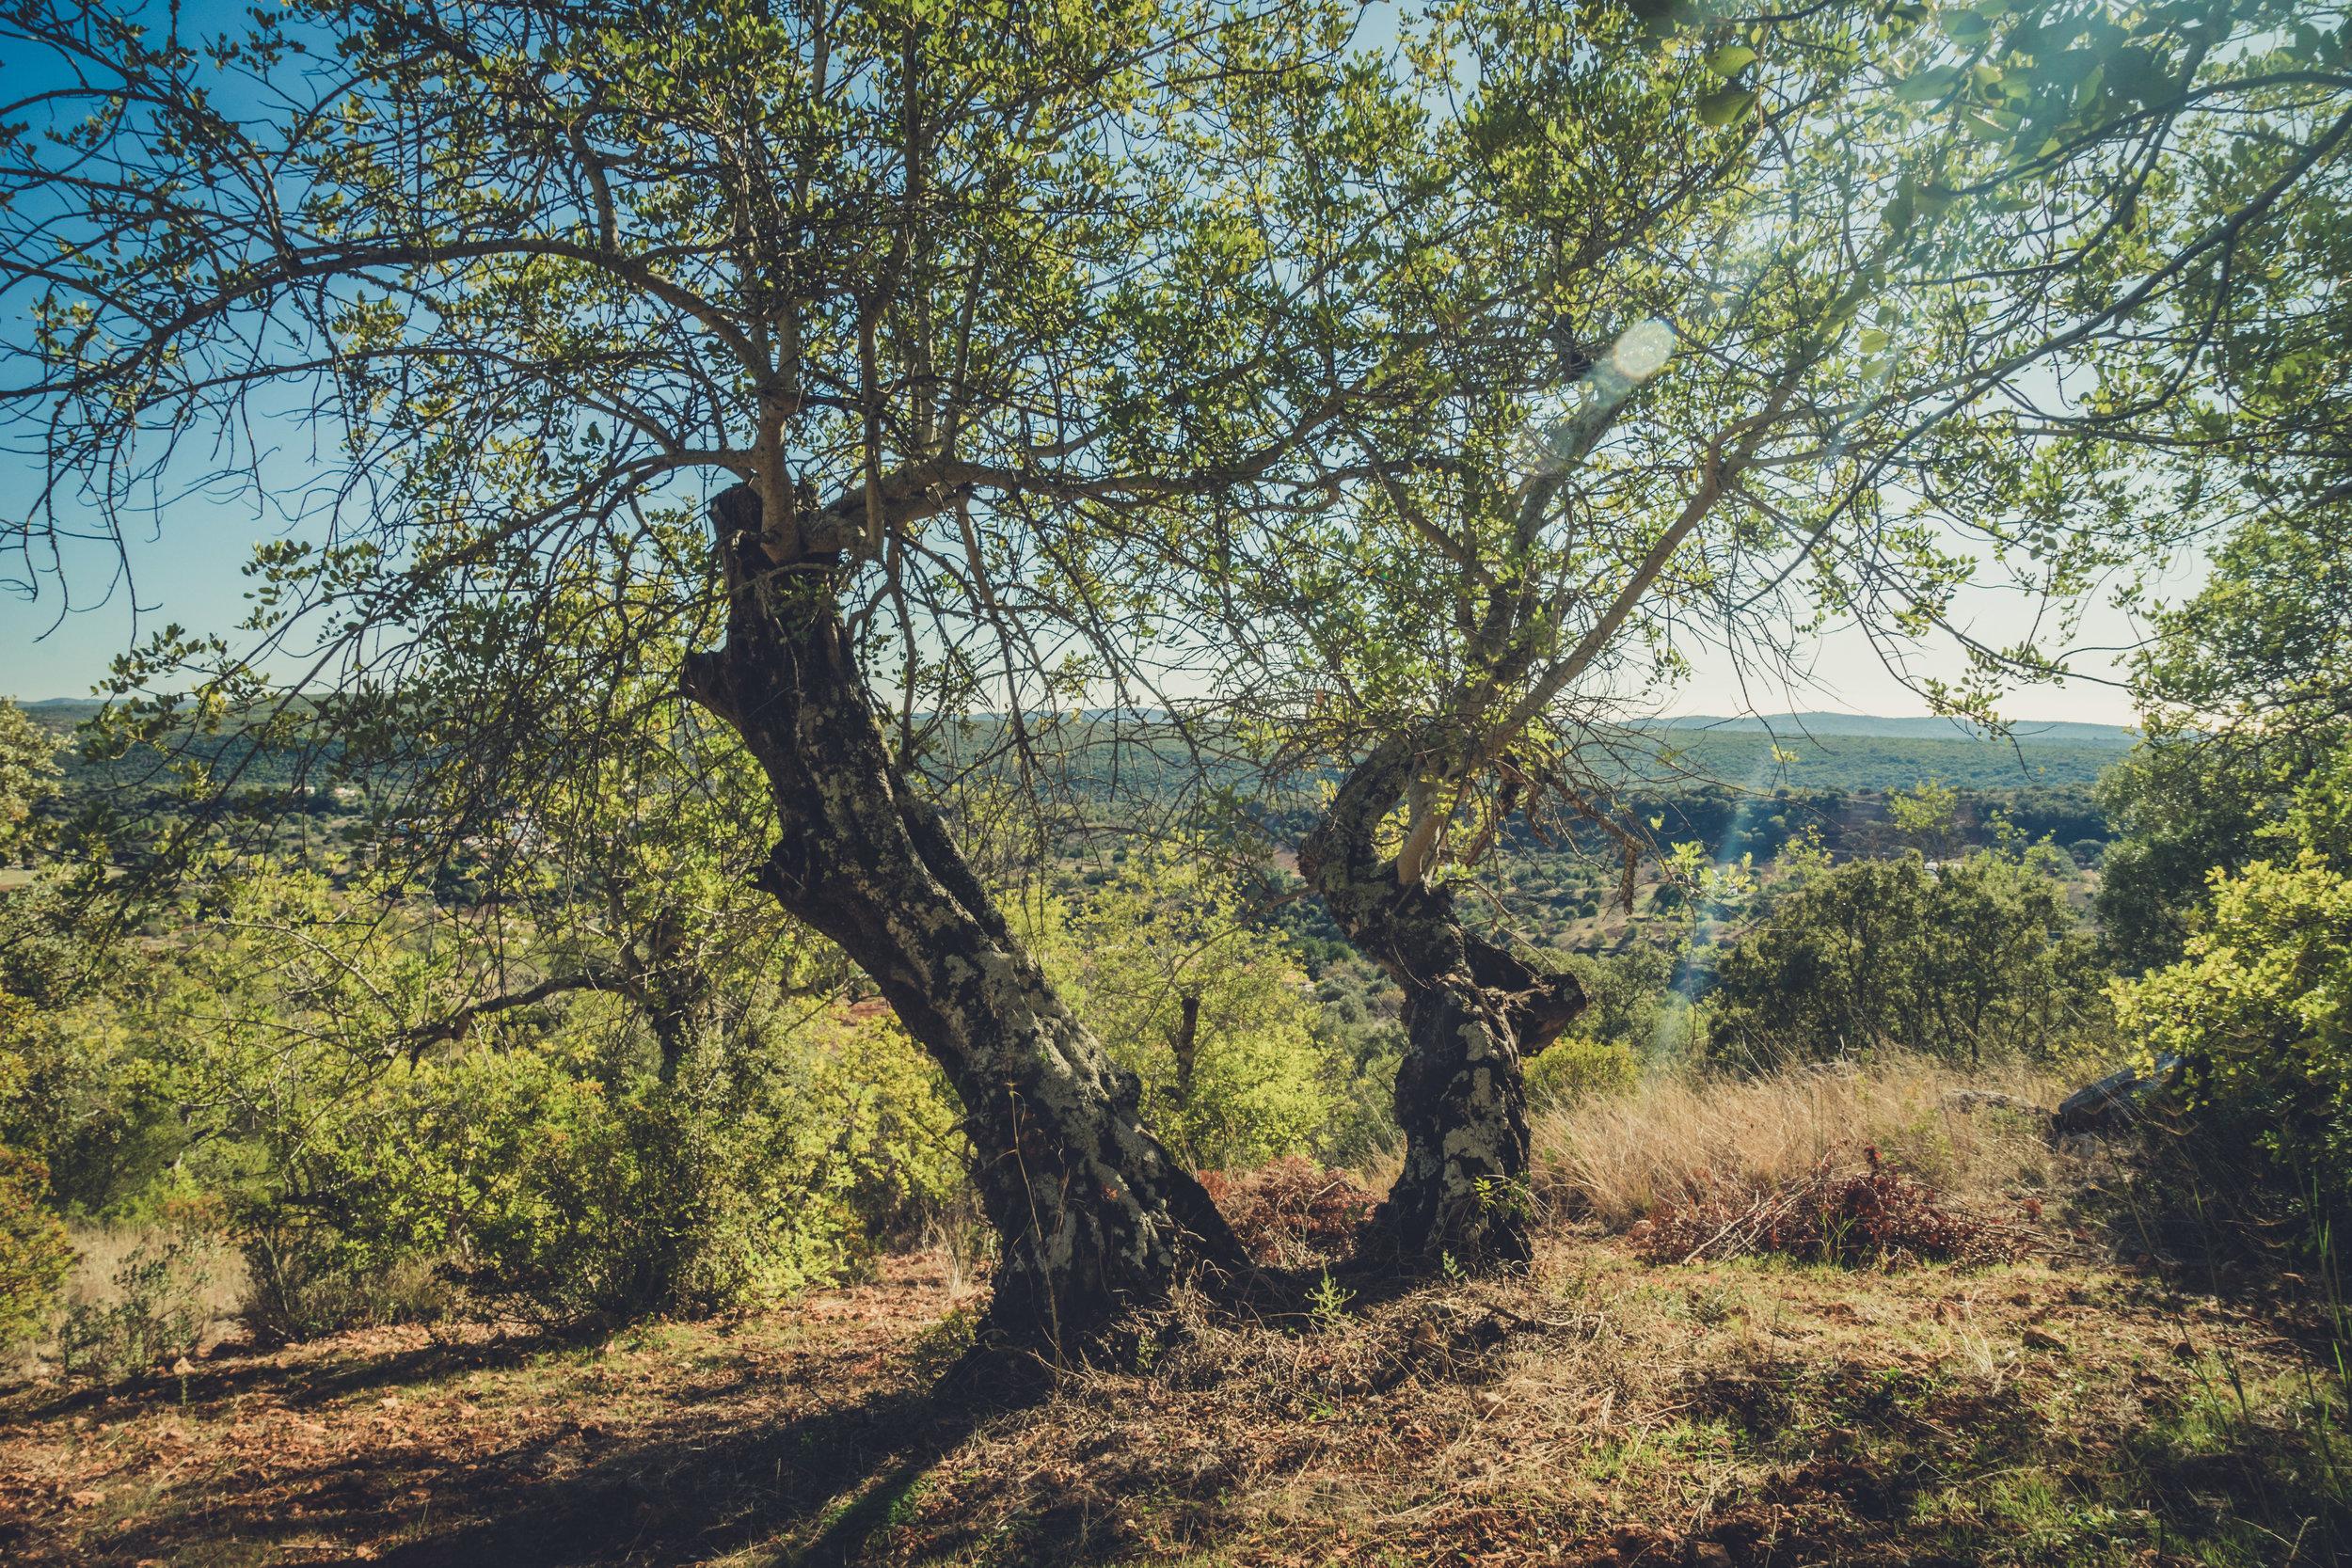 Hiking. algarve. portugal. talbe mountain. walking in the mountains. Rocha da Pena.. tree, view. green.jpg